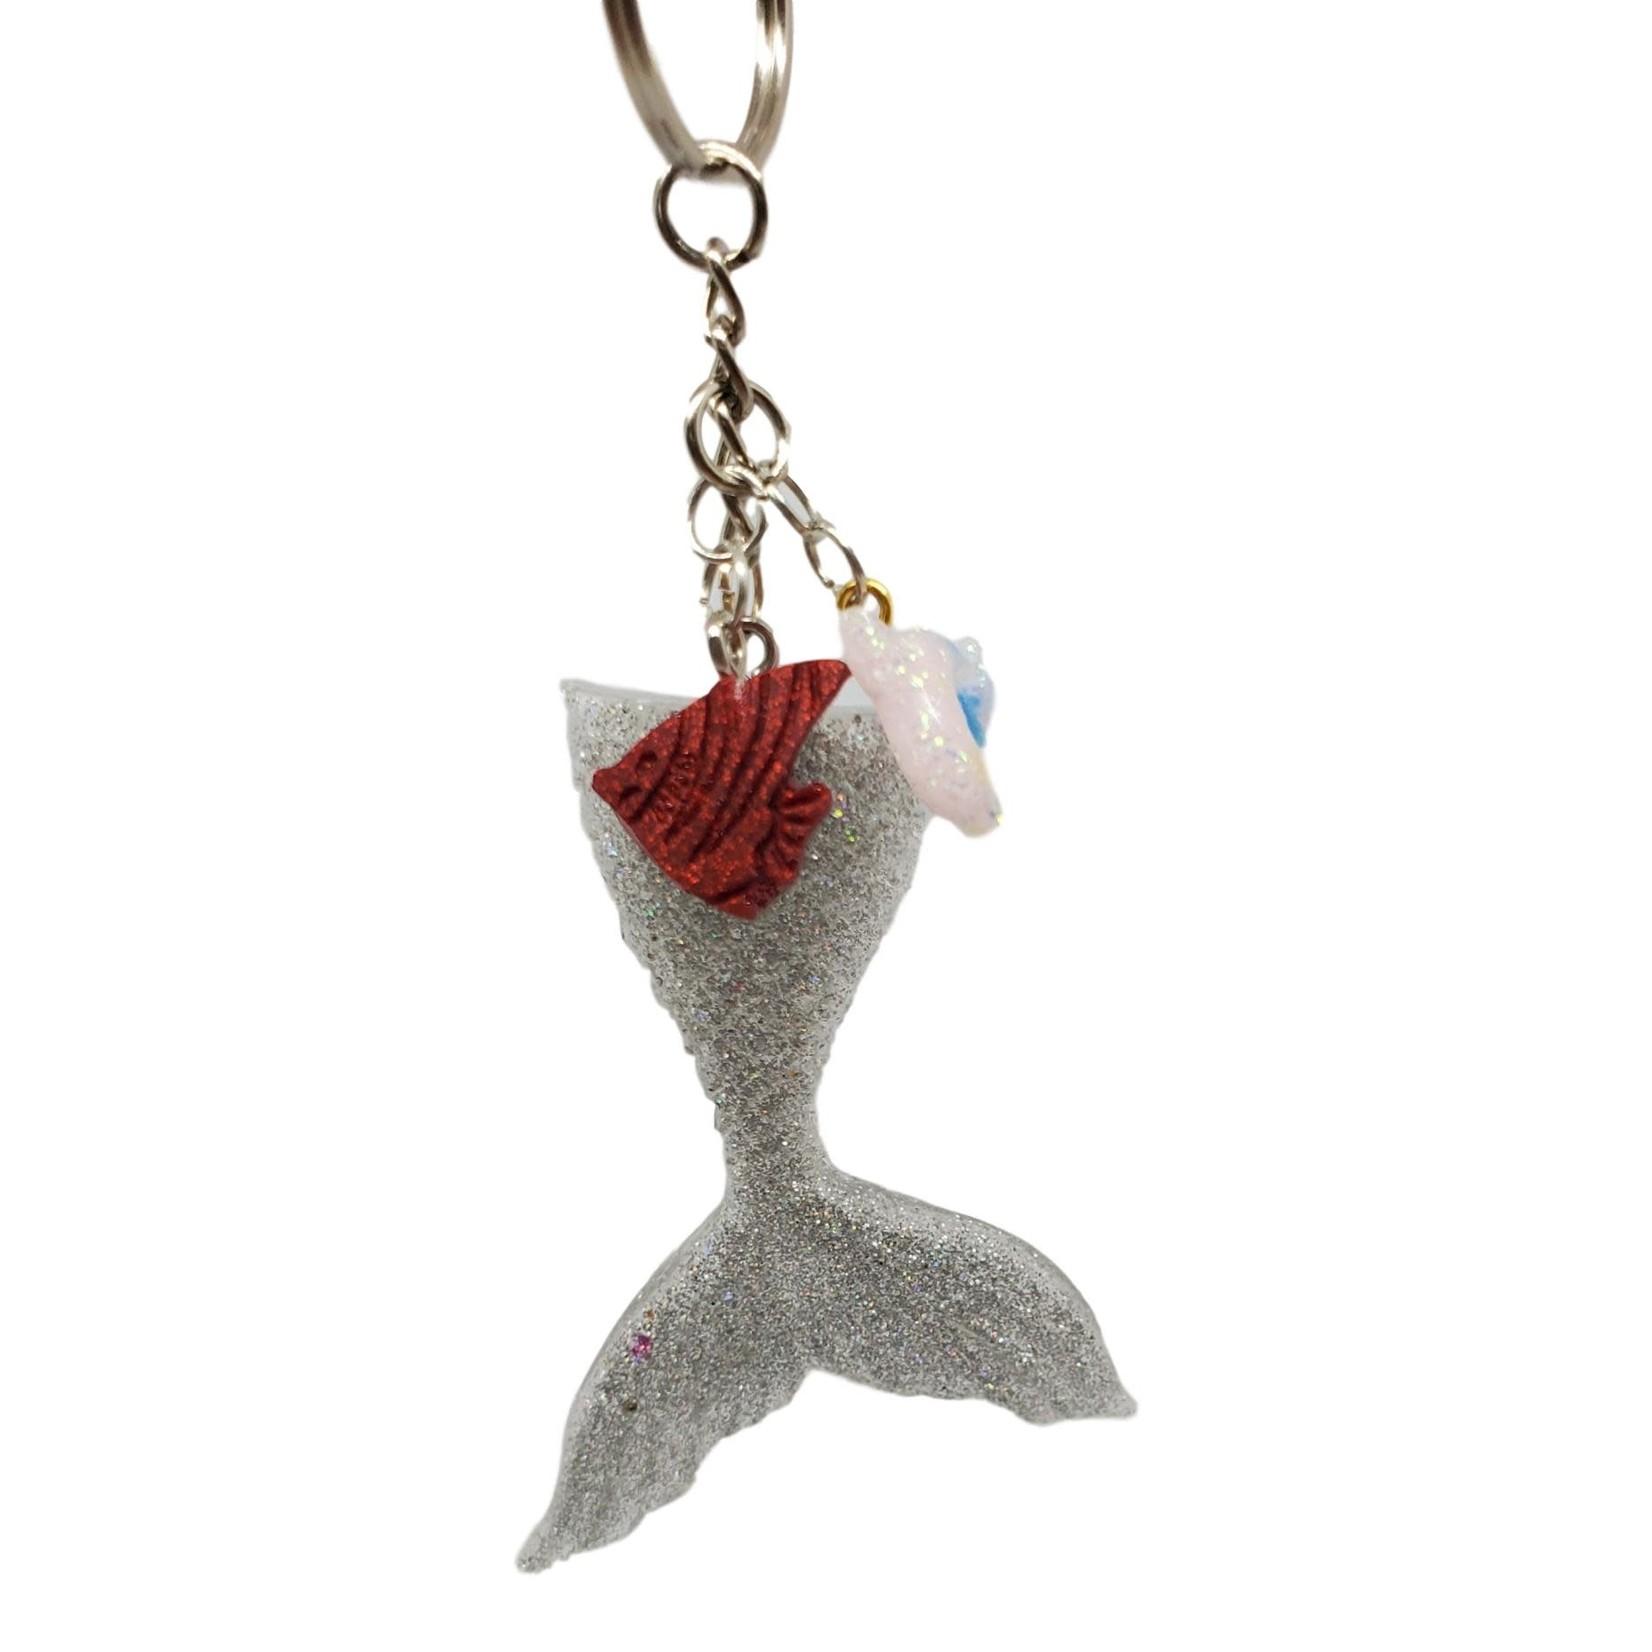 East Coast Sirens Sparkling Silver Glitter Mermaid Tail Key Chain - Medium